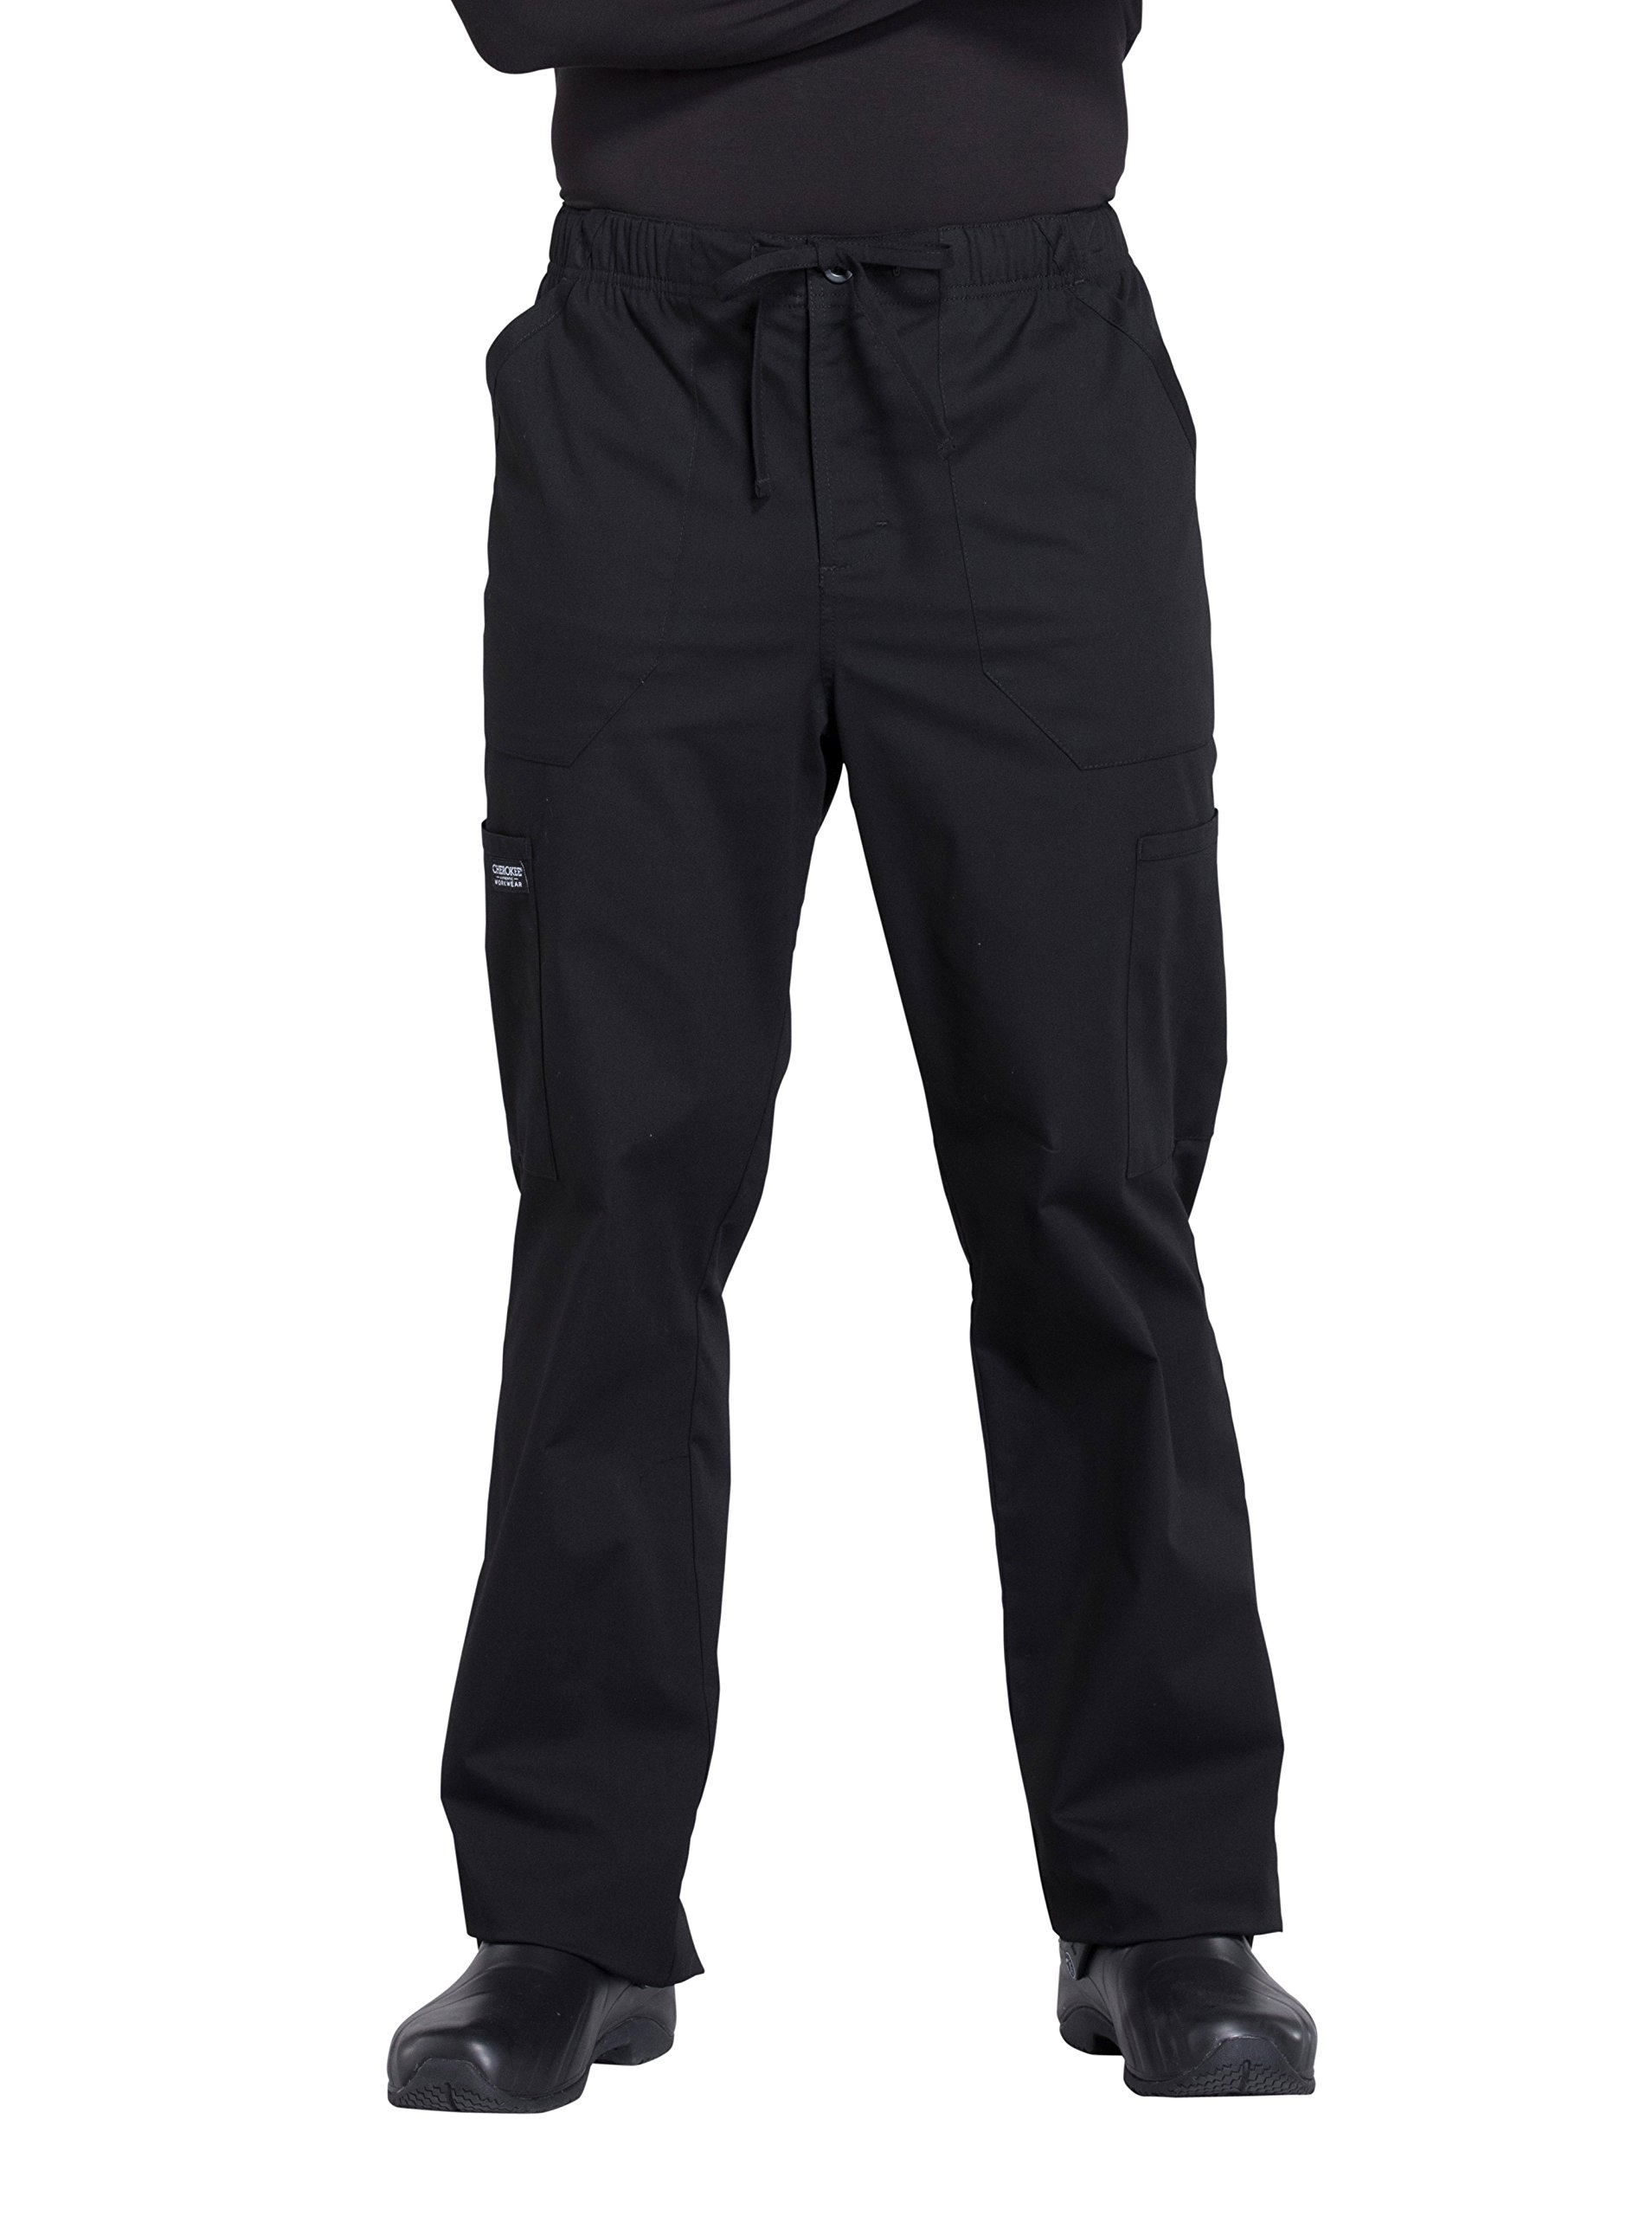 Cherokee Professionals Workwear Men's Tapered Leg Zip Fly Drawstring Scrub Pant Medium Tall Black